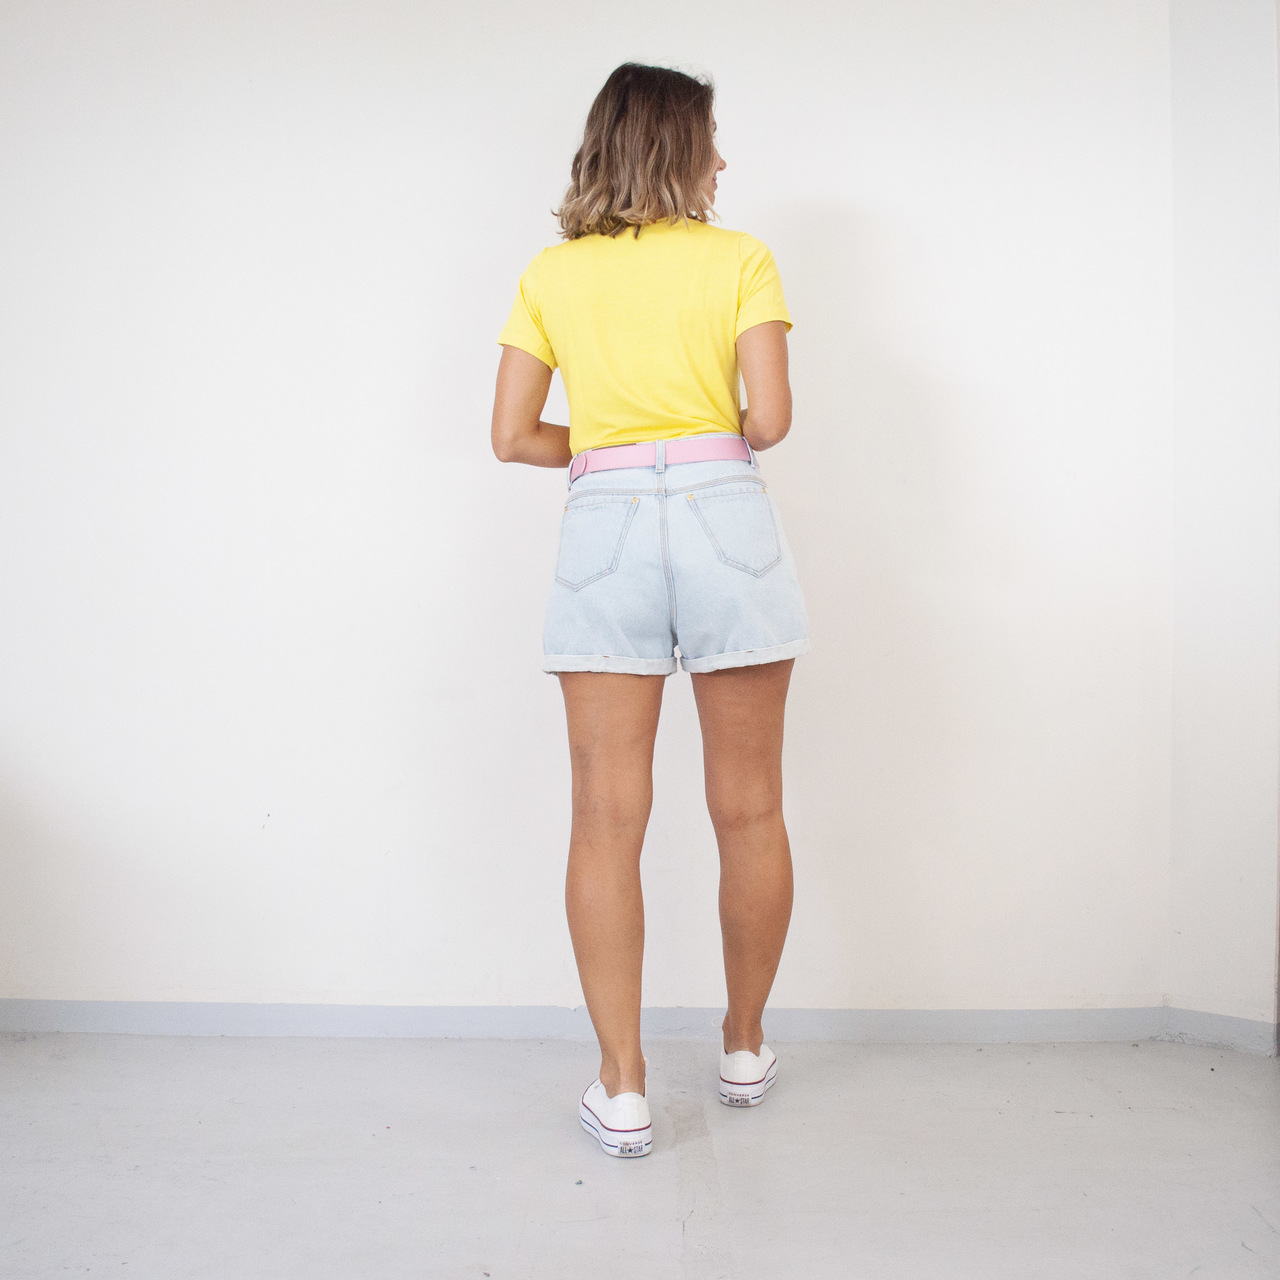 T-Shirt Viscolycra Gola U -  Vibes - Amarelo